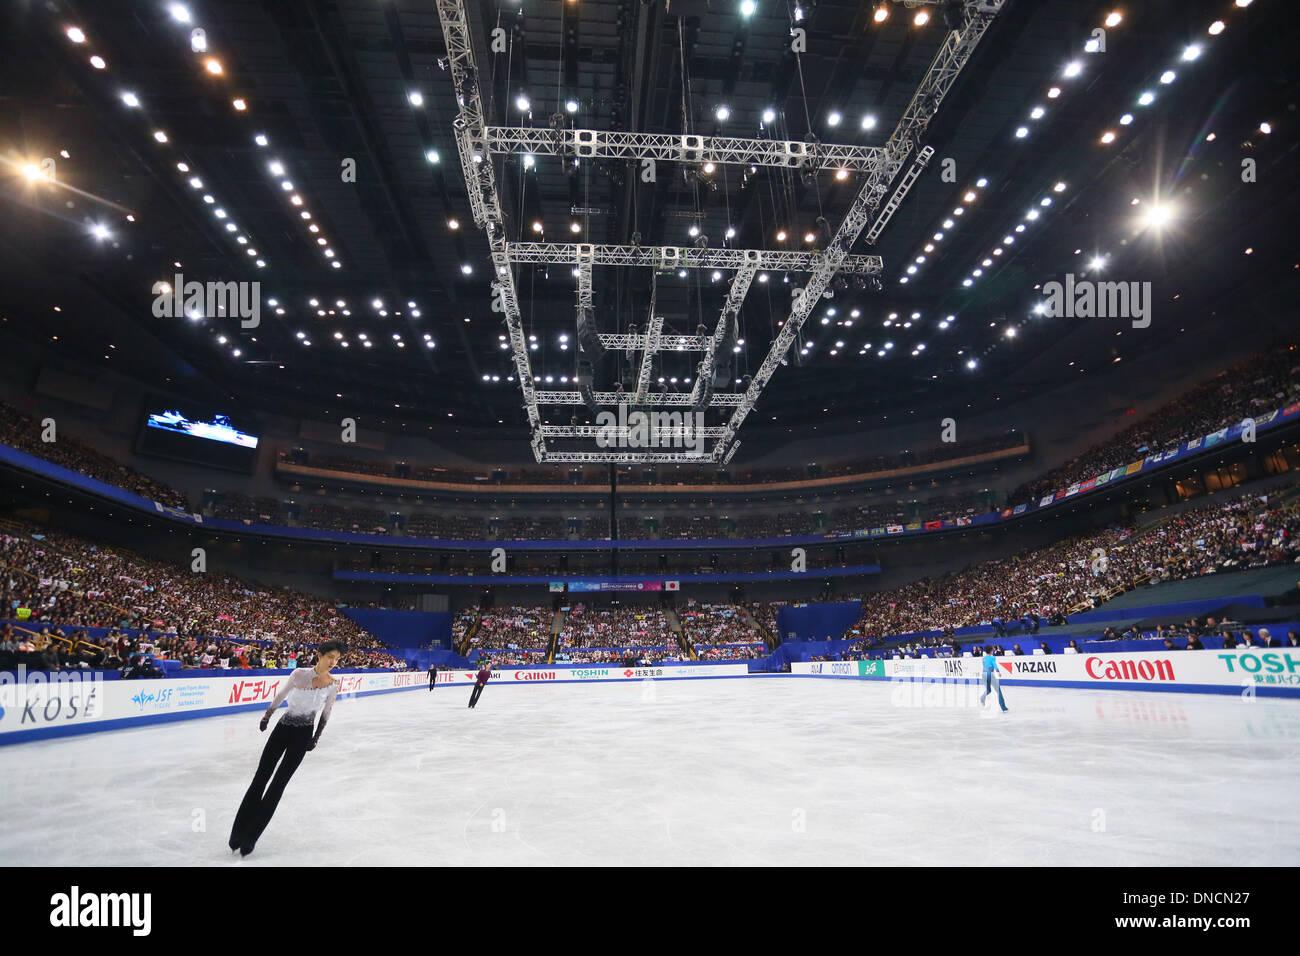 Saitama Super Arena Stock Photos & Saitama Super Arena Stock Images - Alamy